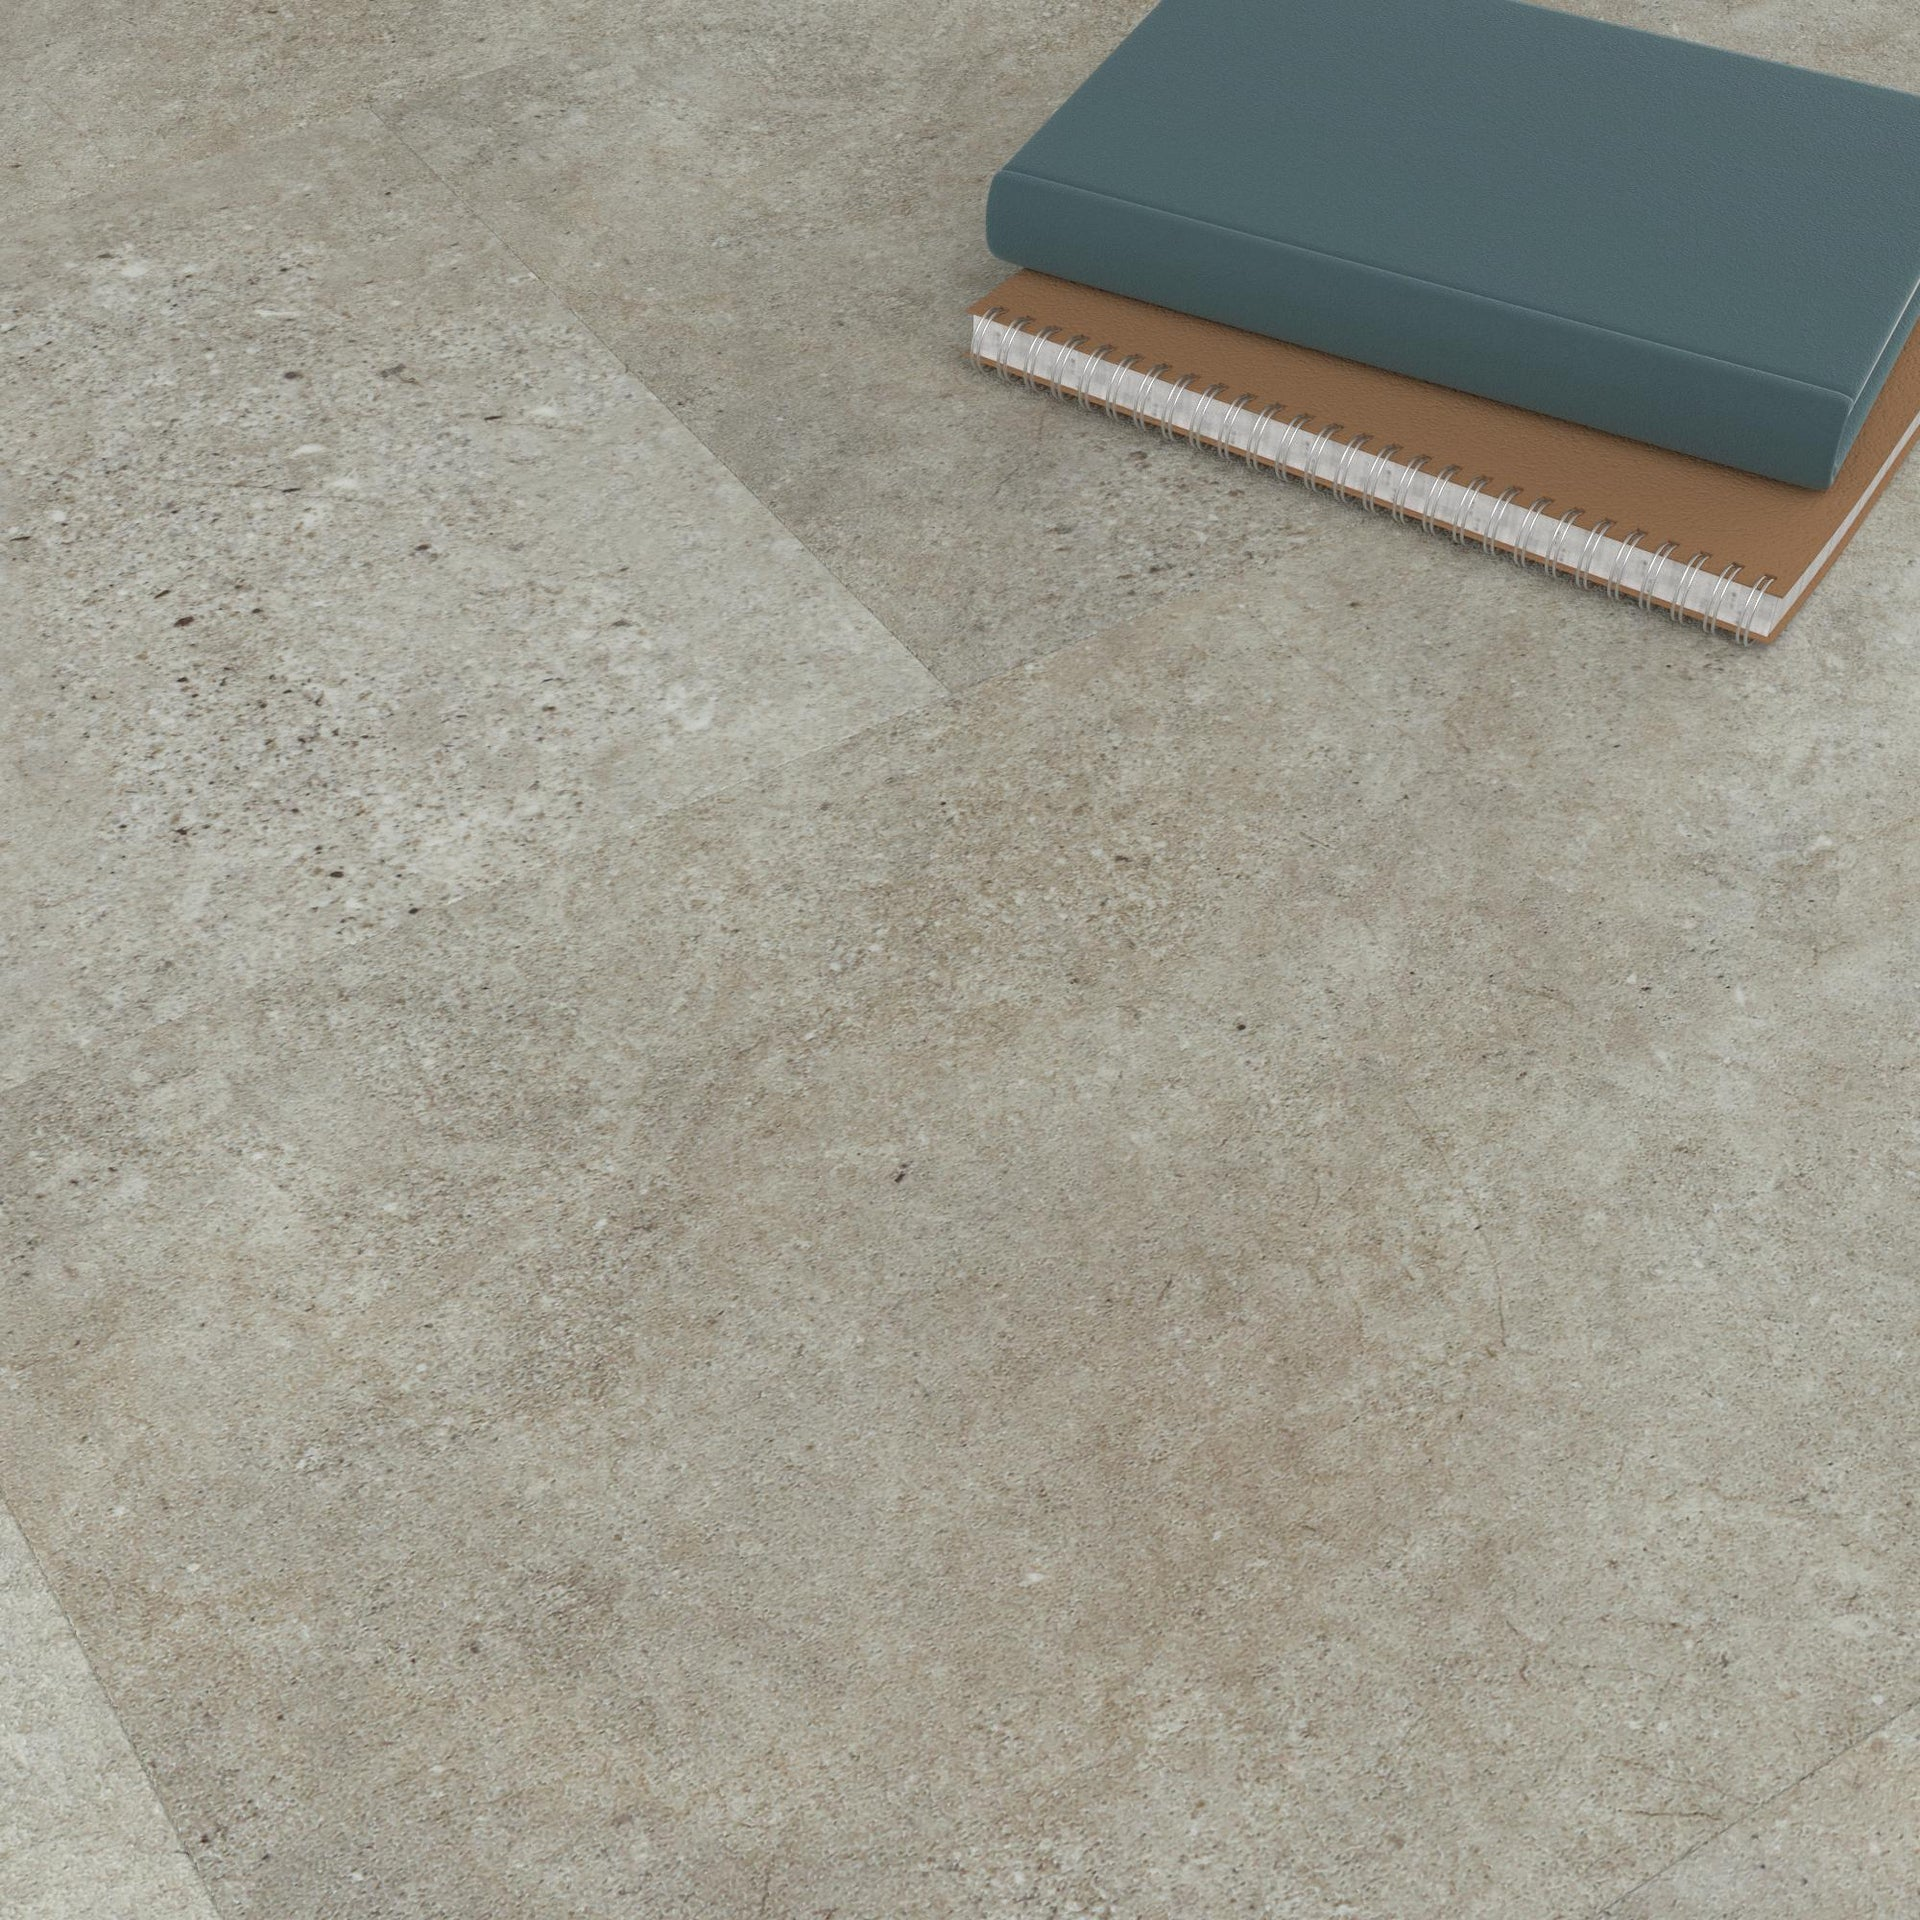 Pavimento PVC flottante clic+ Jaraoso Sp 4.2 mm beige - 5